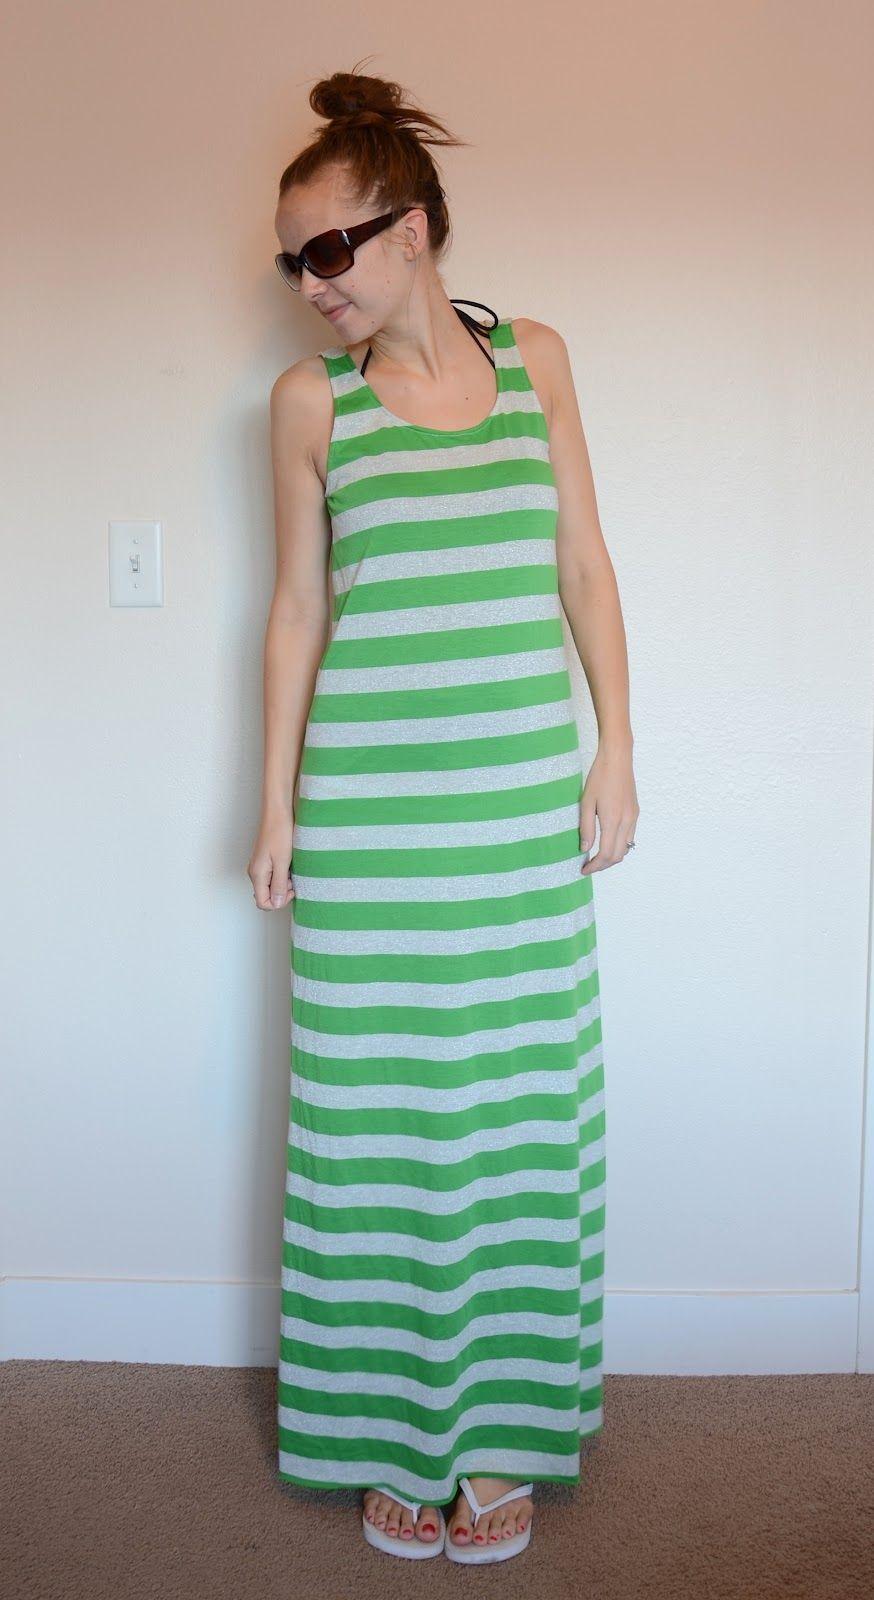 Swimsuit coverup maxi dress tutorial